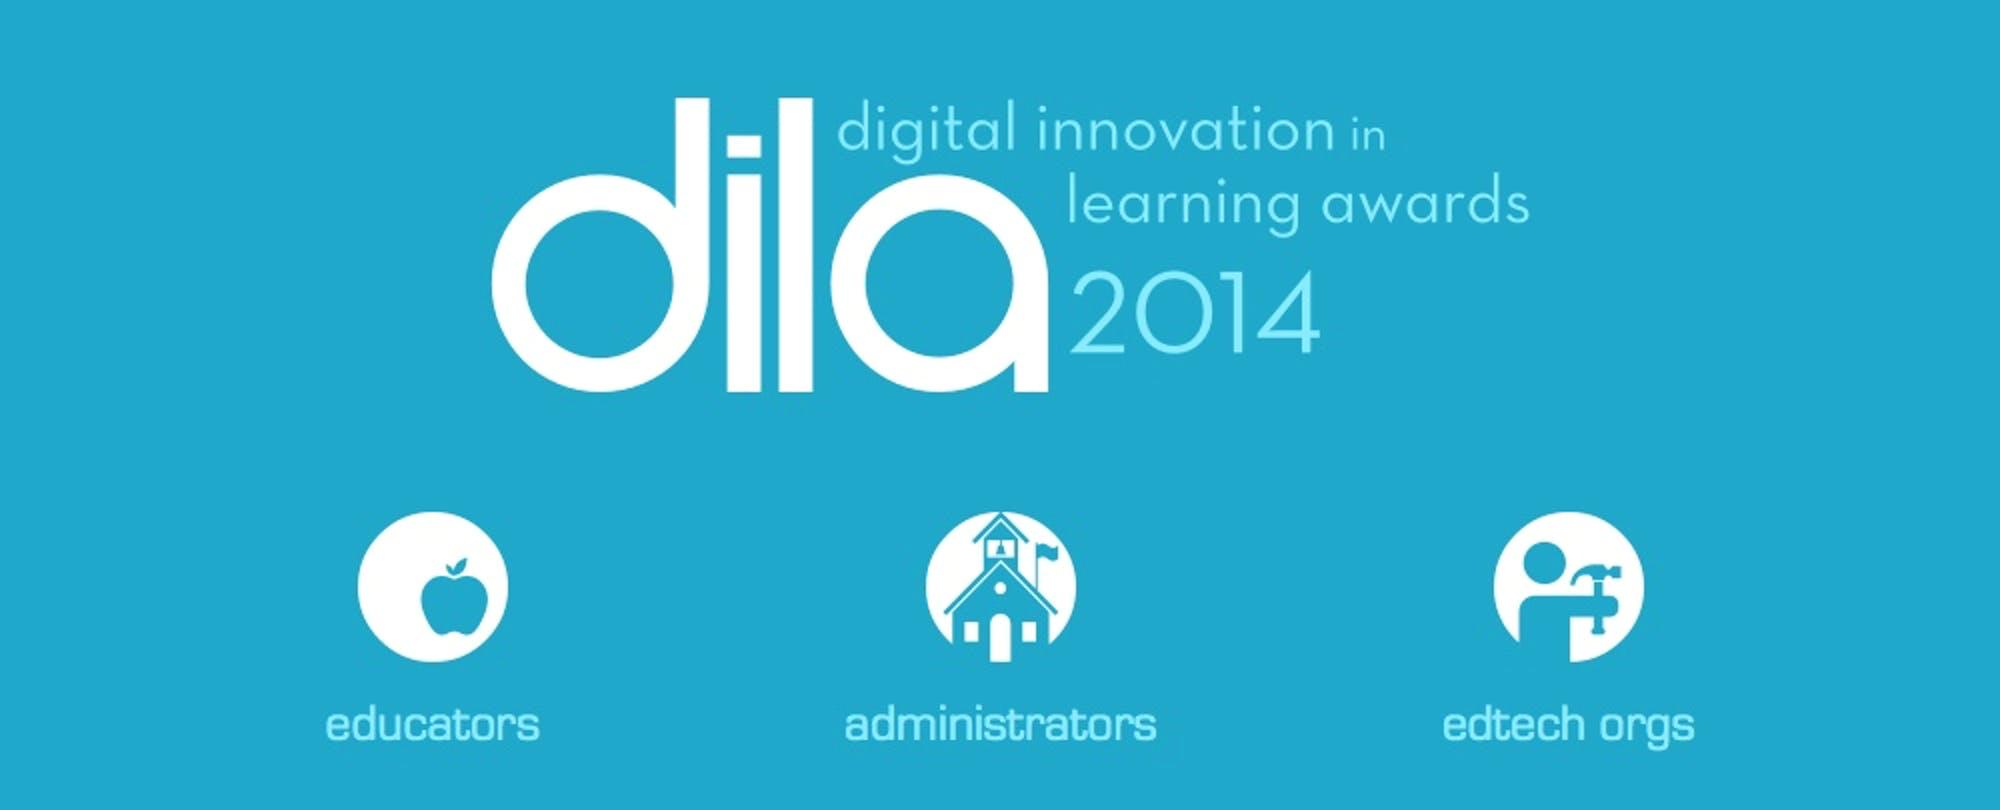 EdSurge-Digital Promise Showcase Education Leaders Through New Awards